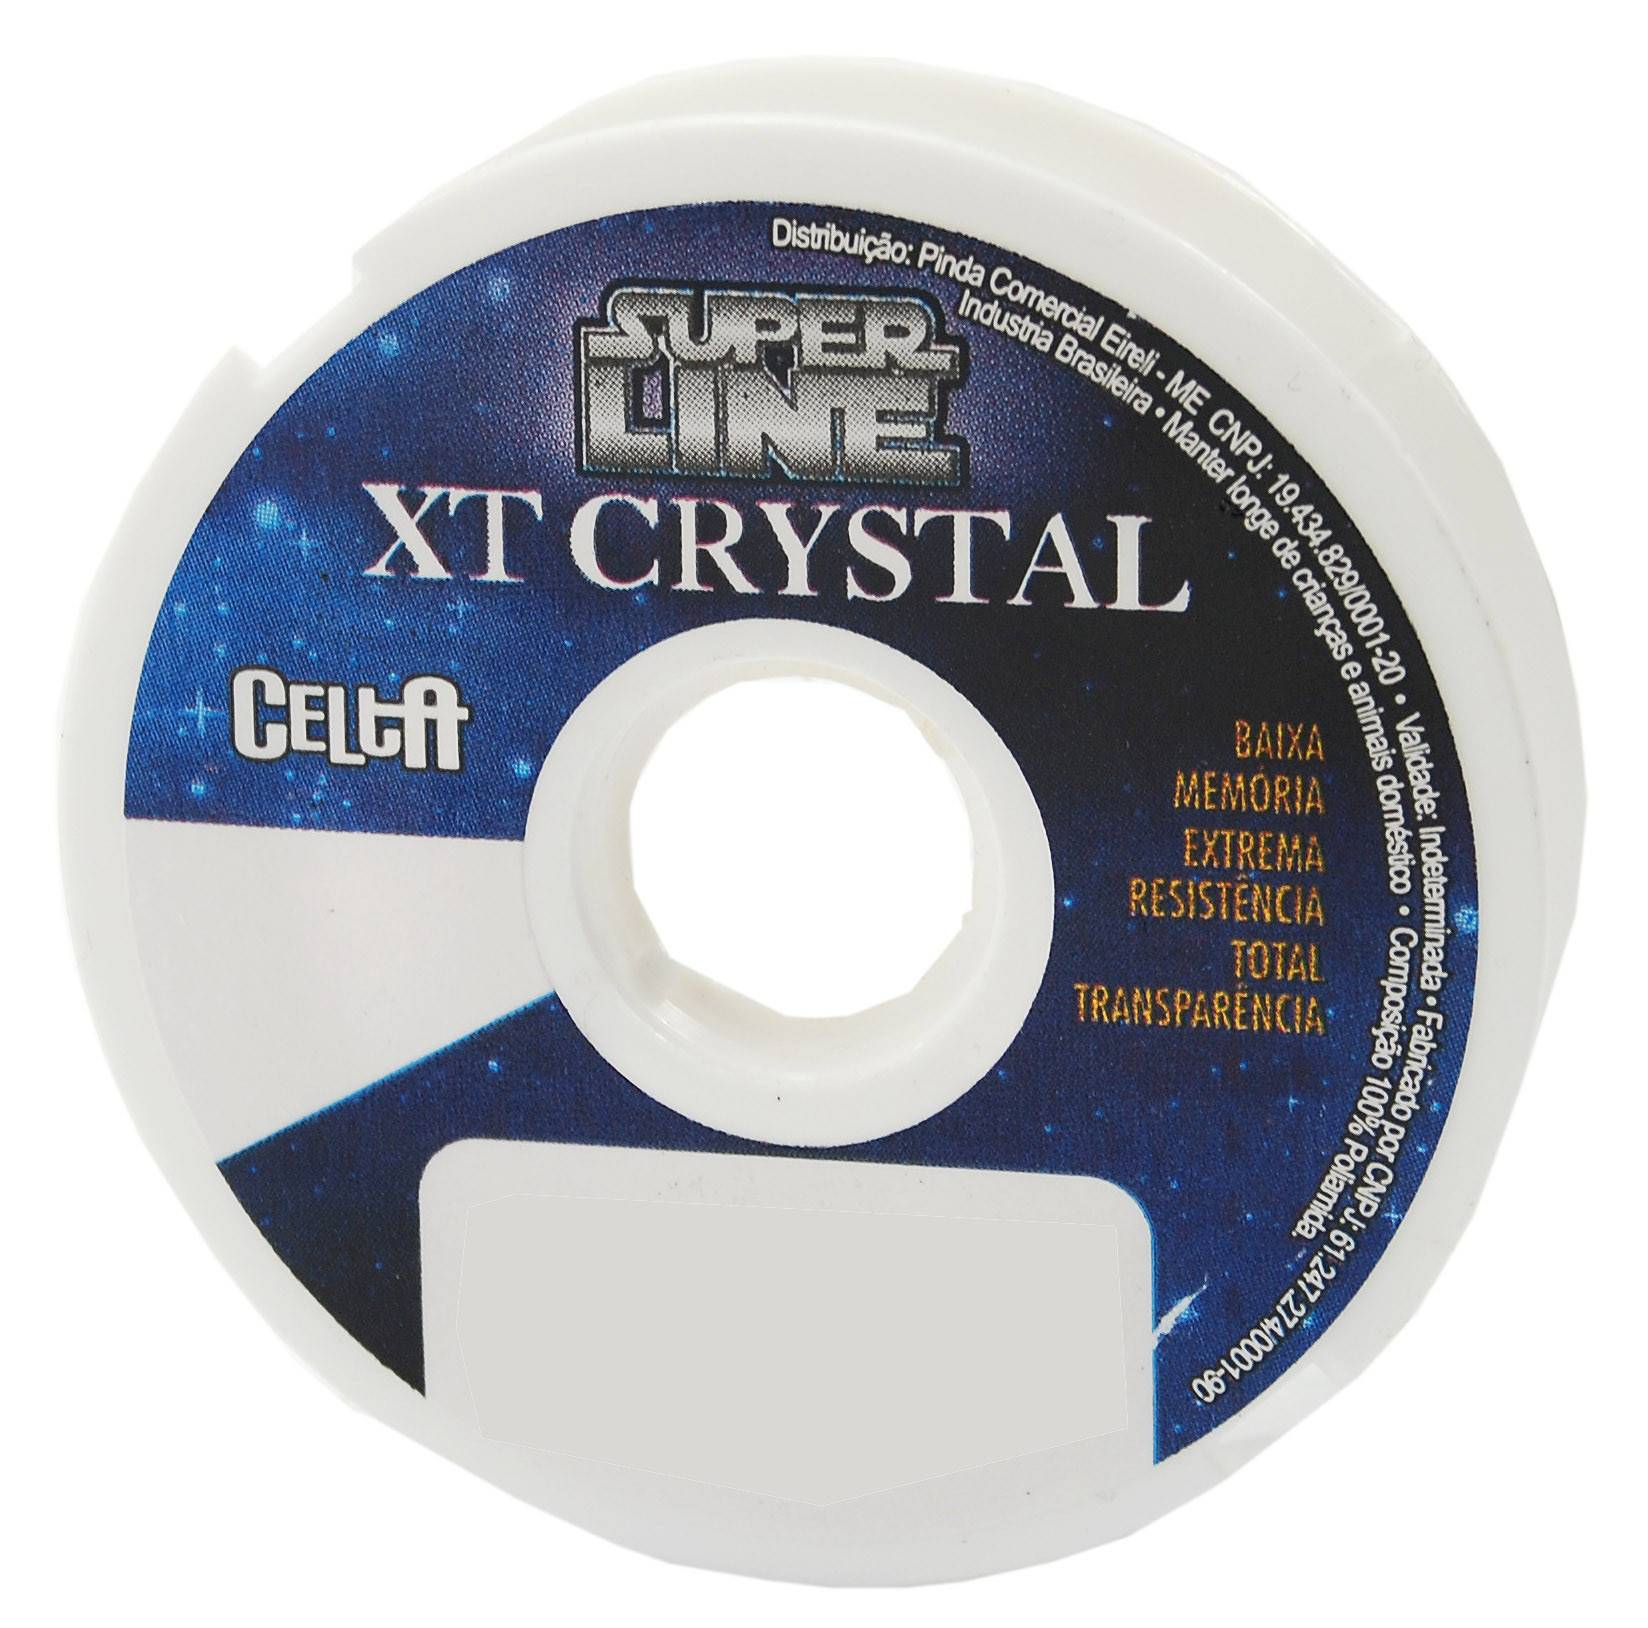 Linha Mono Celta XT Crystal e Titanium 0,25mm 10,6lbs/4,8kg - 120 Metros